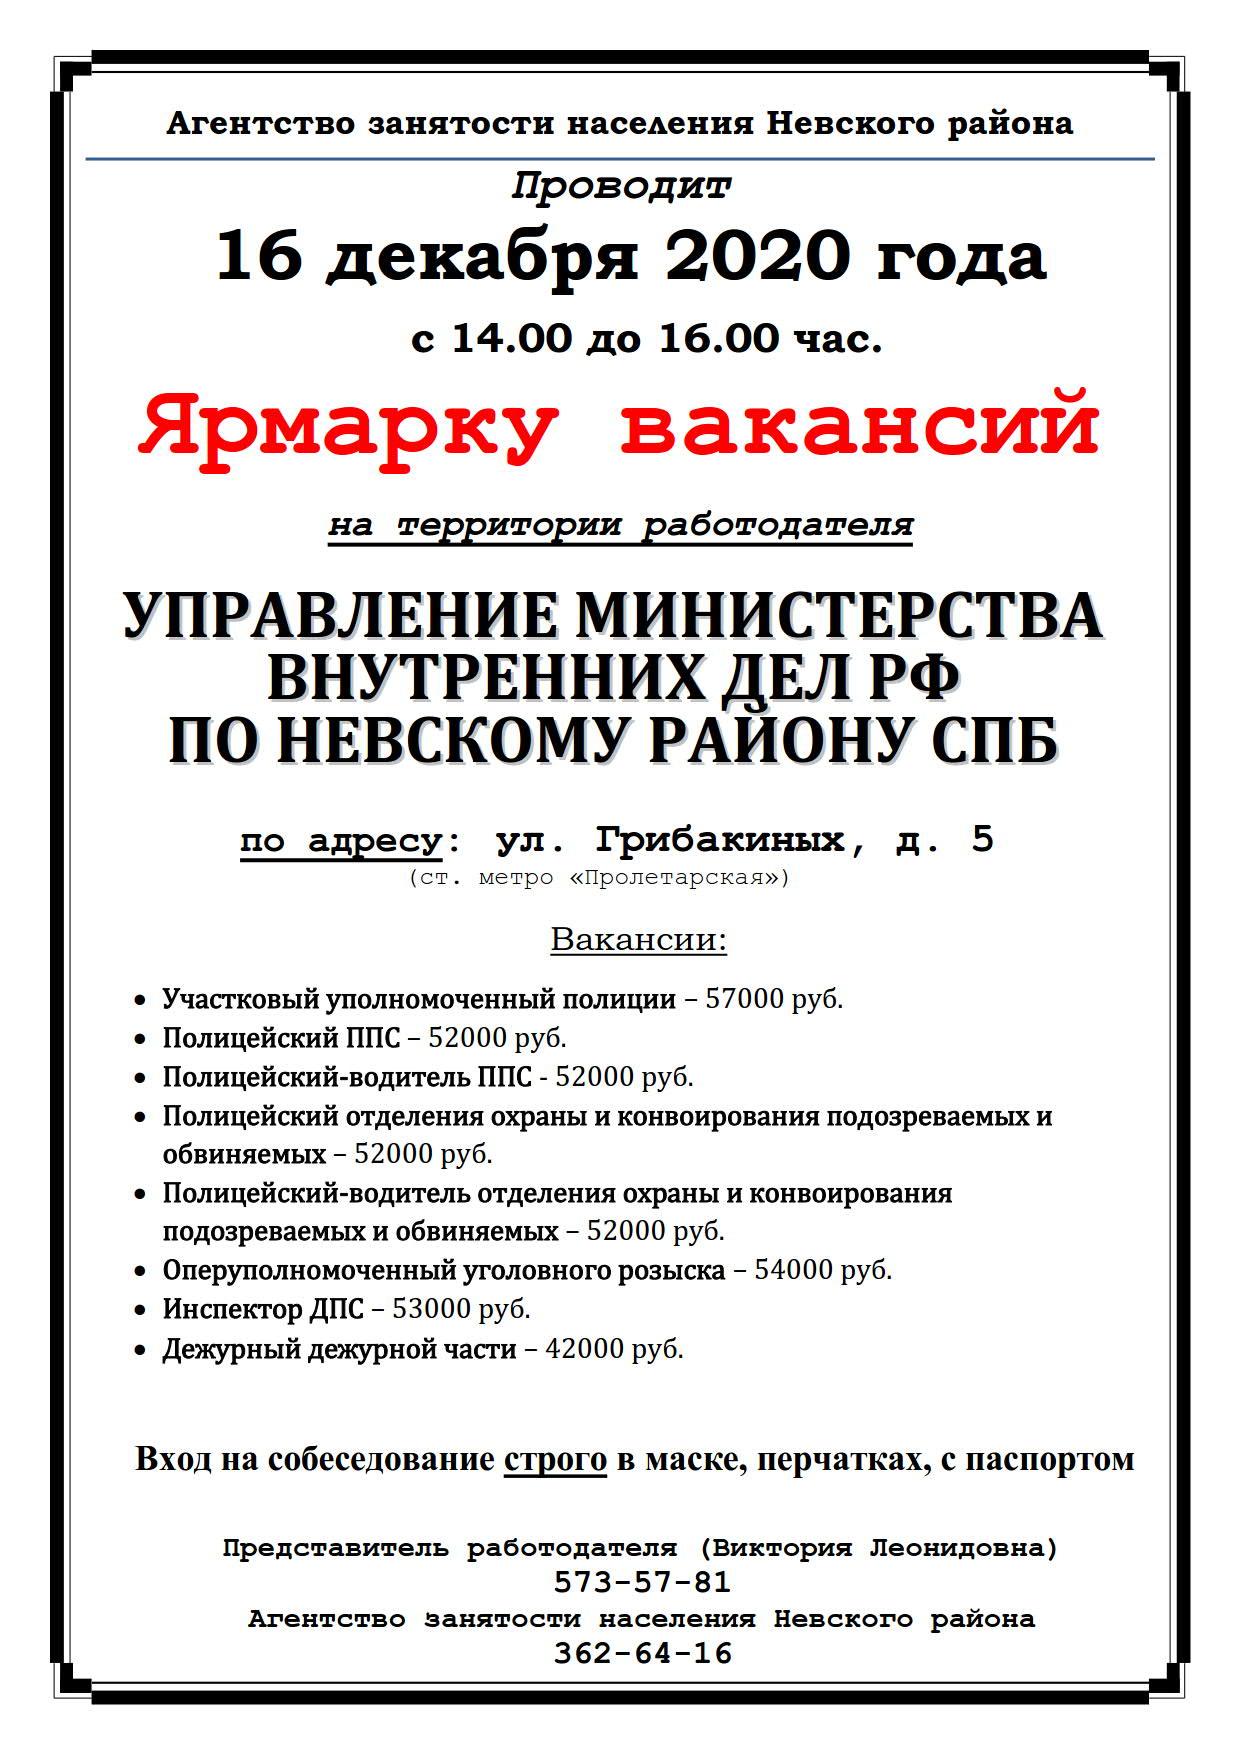 объявление ЯВ, 16.12.2020_1